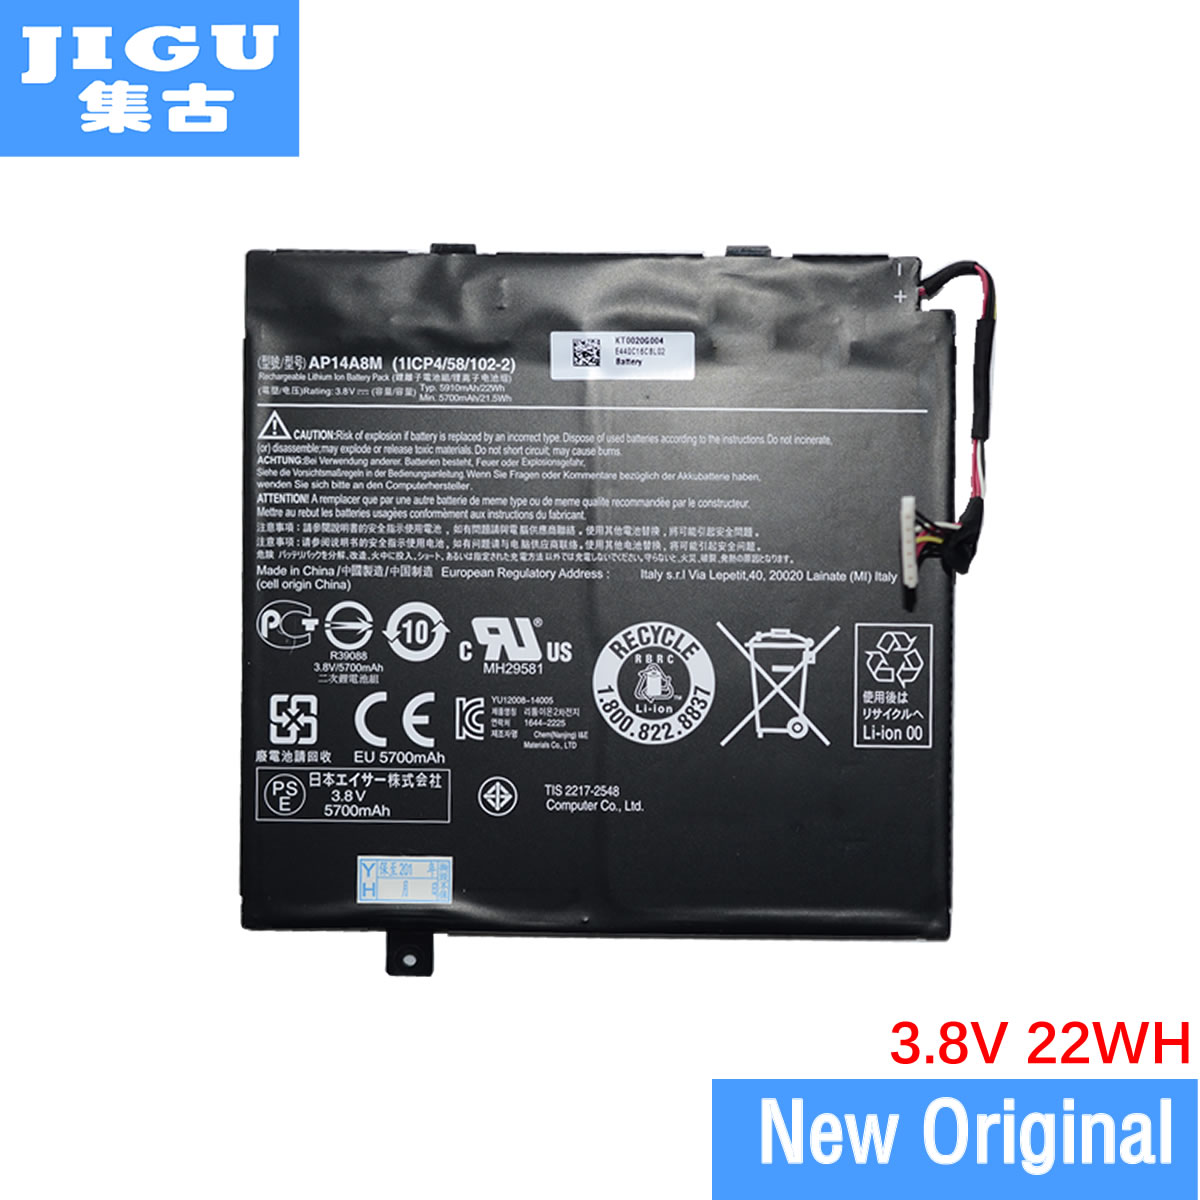 JIGU-بطارية كمبيوتر محمول أصلية 1ICP4/58/102-2 AP14A8M ، لأجهزة Acer و Aspire Switch 10 10E 11 11V